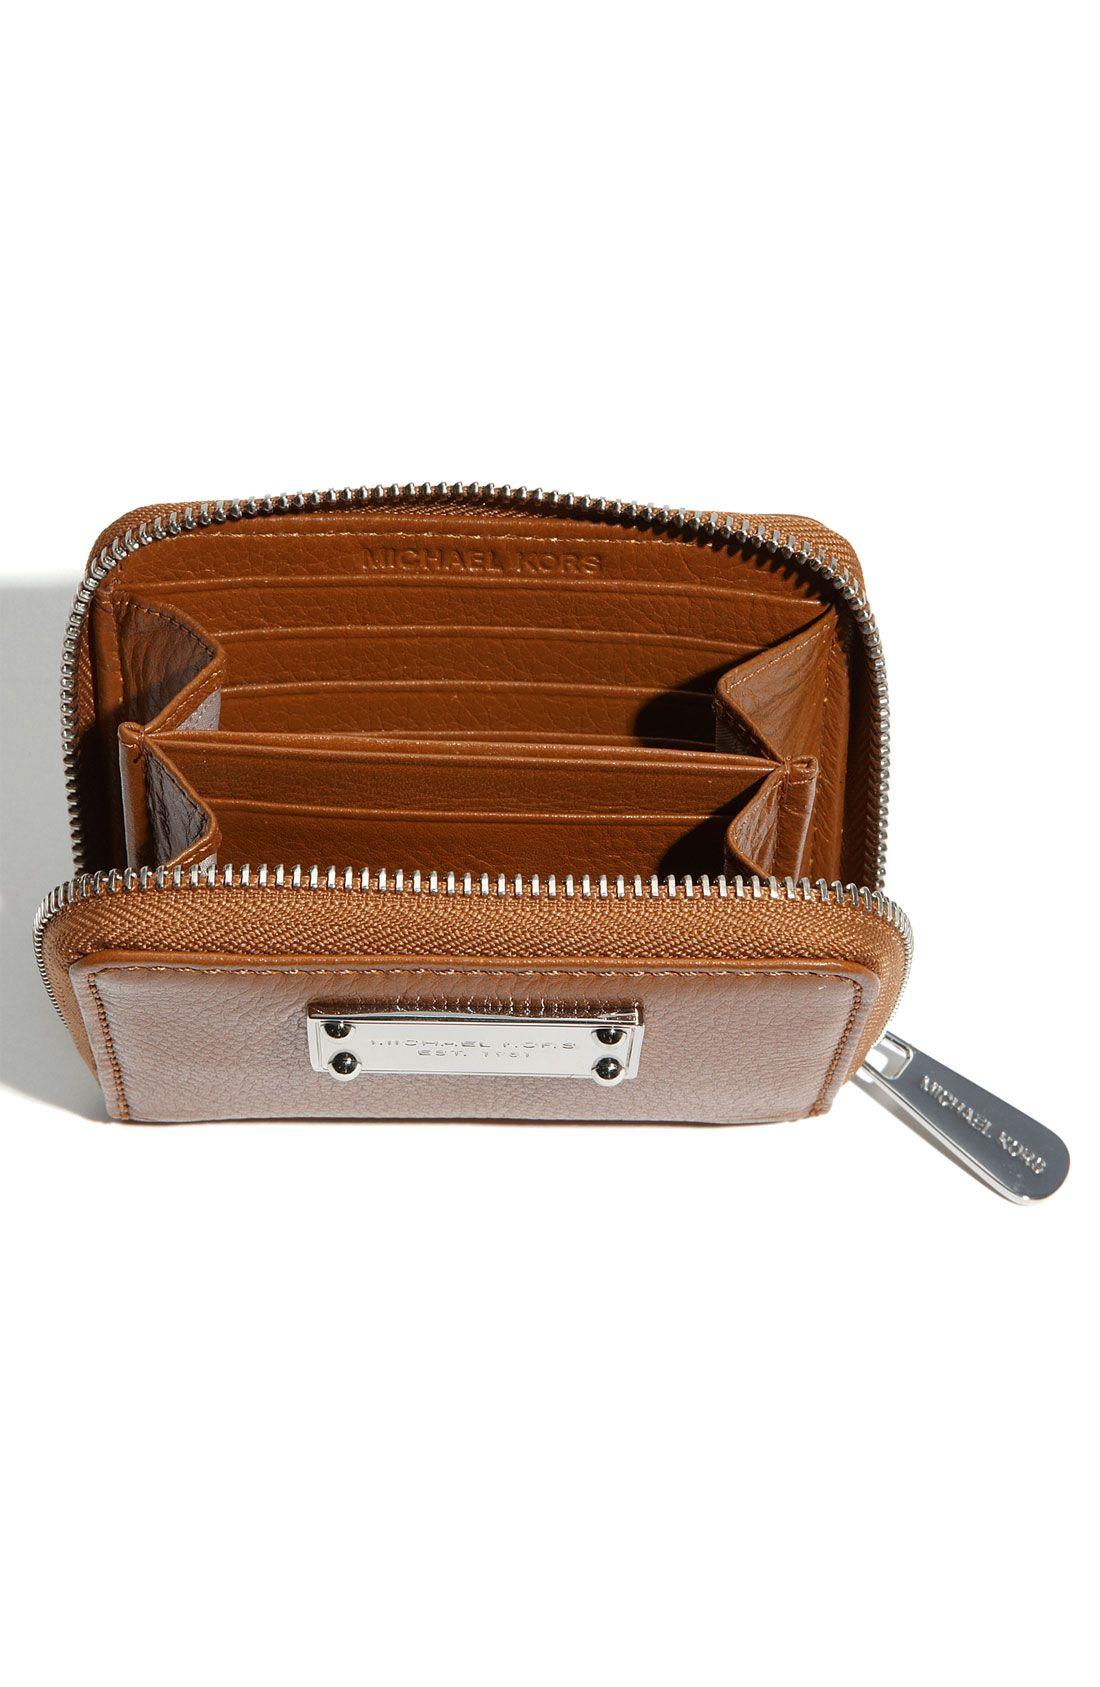 04151694f1ddb6 Michael Kors Wallet Small Zip Around   handbags & clutches   Michael ...